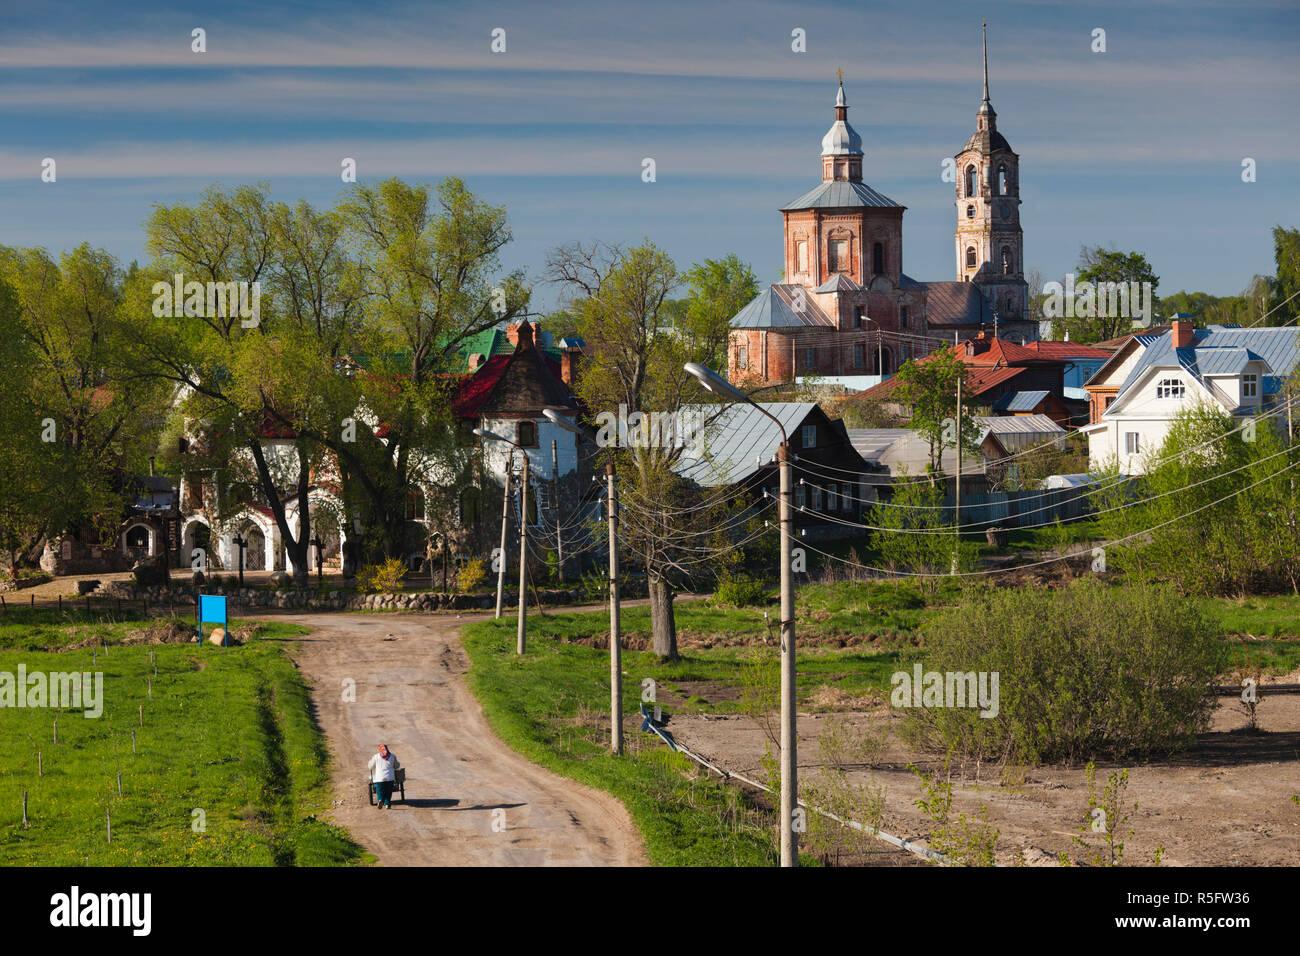 Russia, Vladimir Oblast, Golden Ring, Suzdal - Stock Image